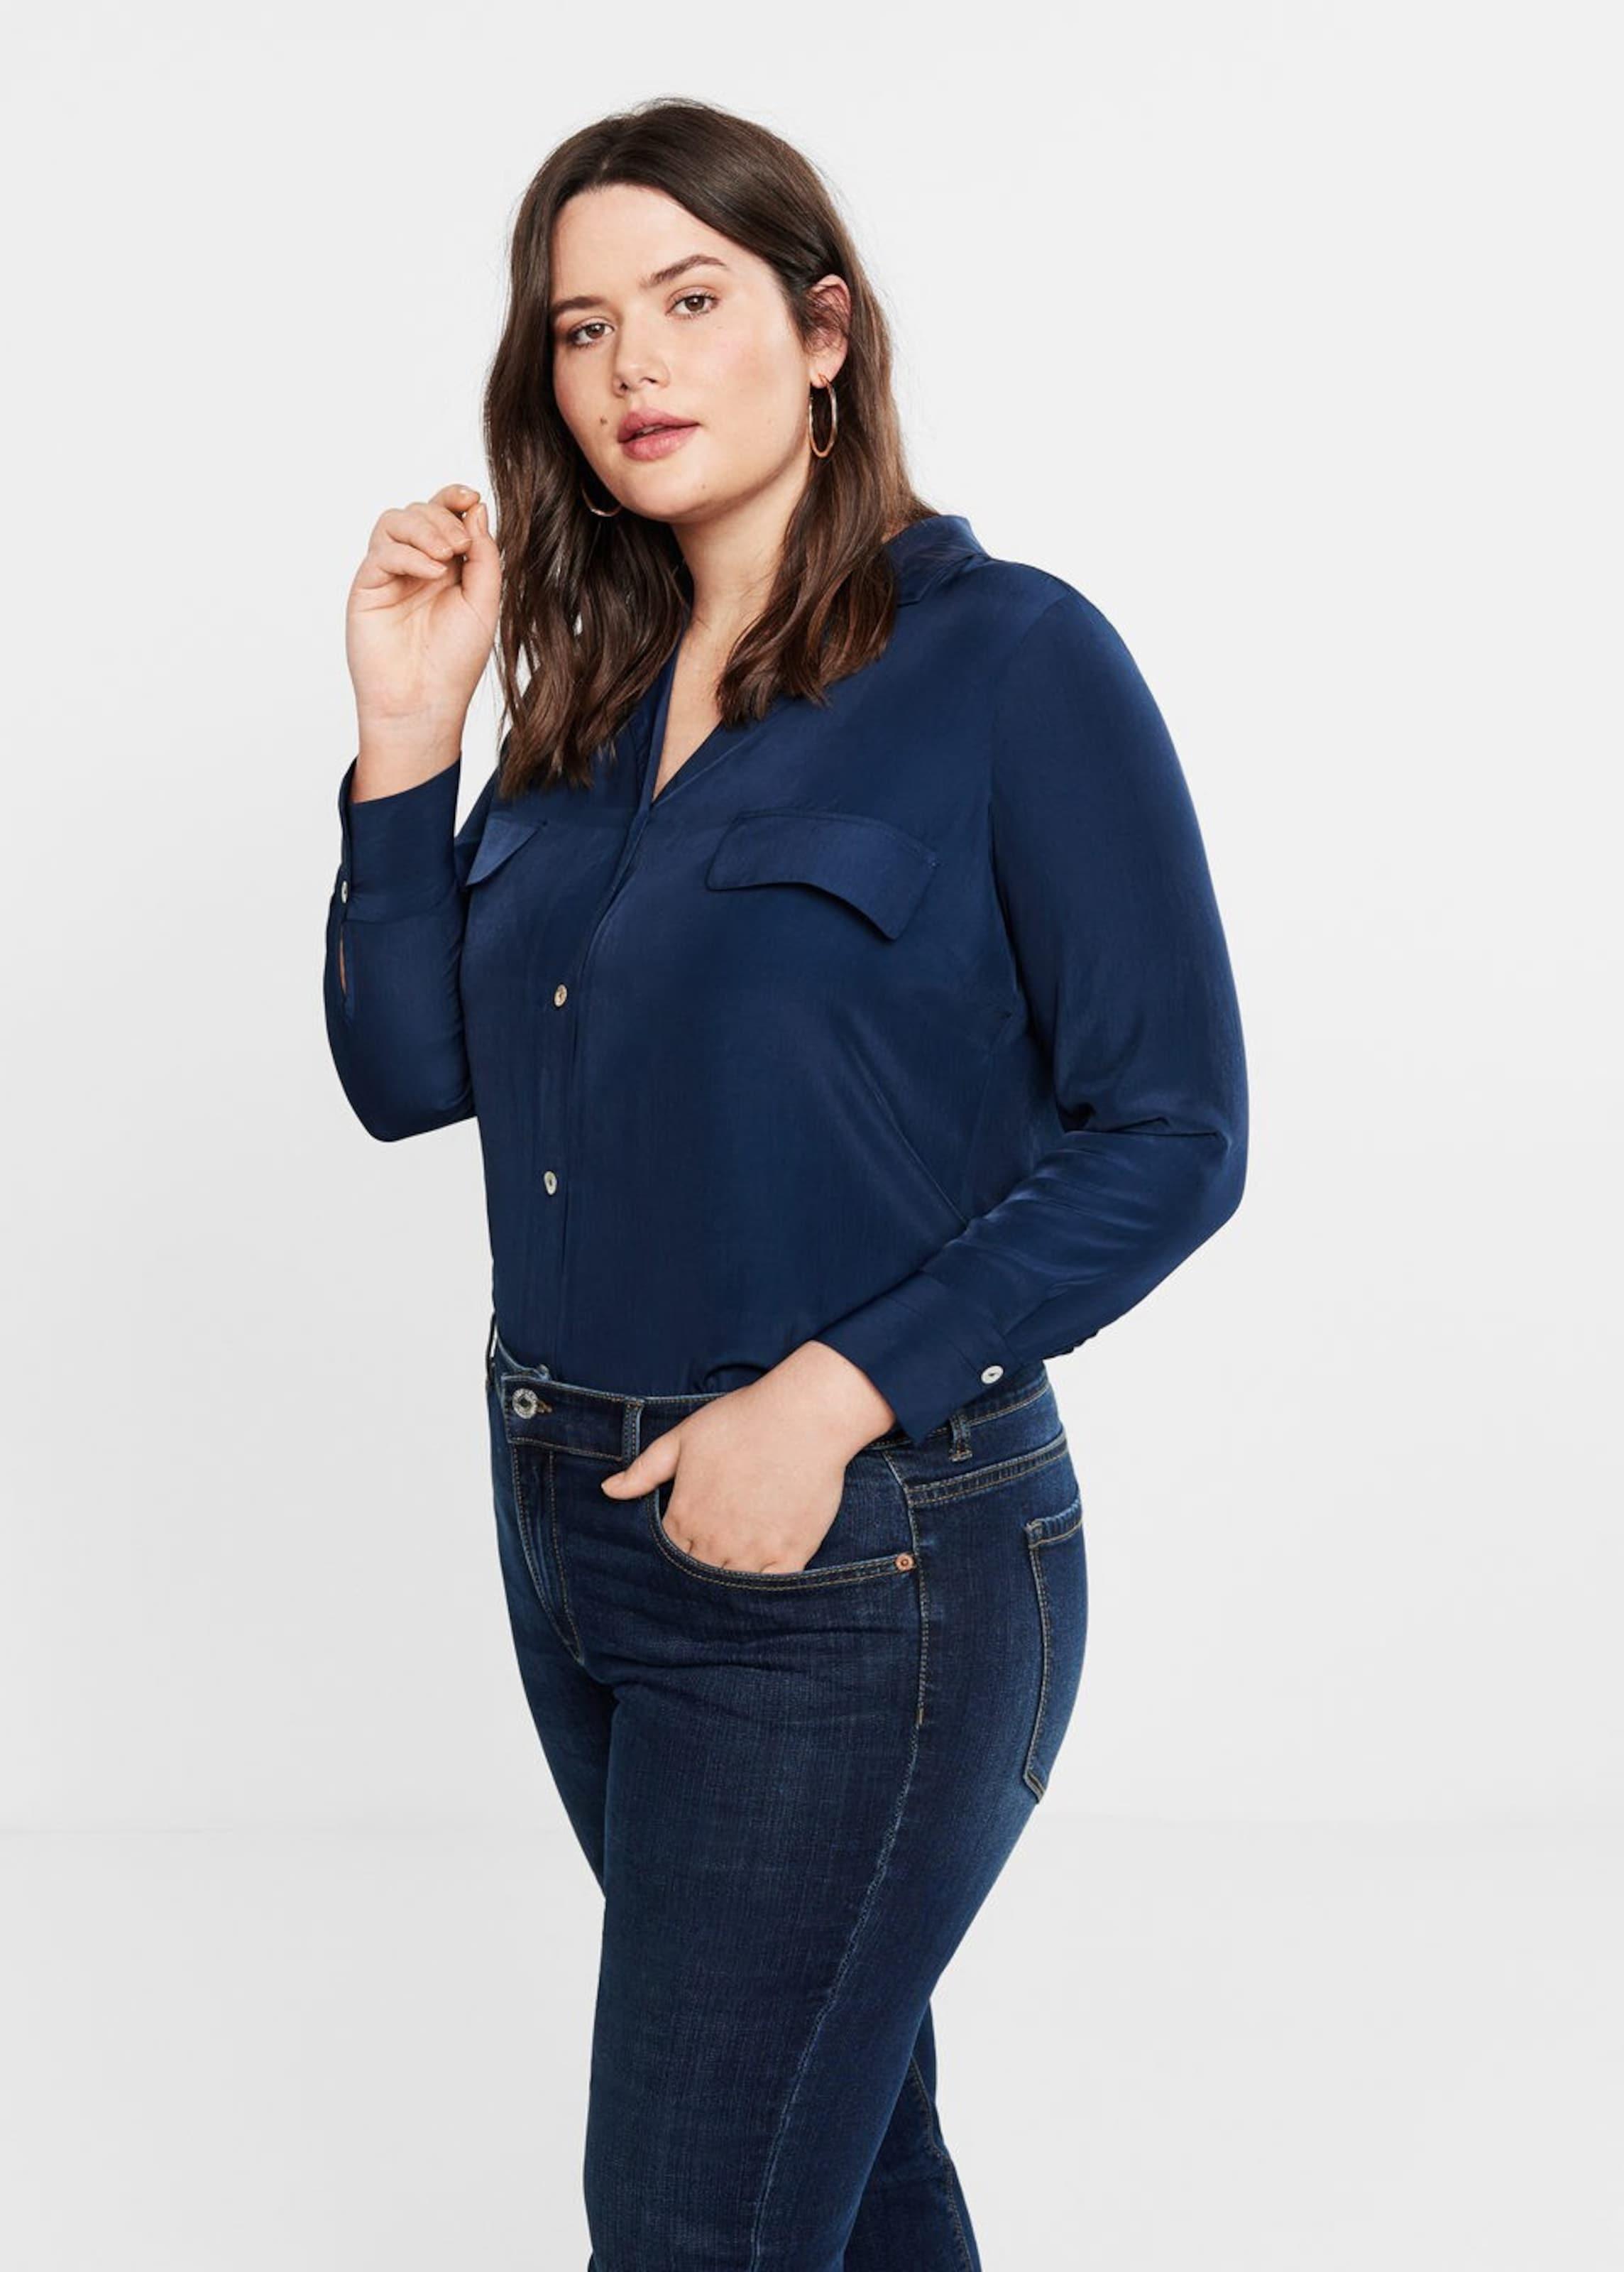 In Jeans By Dunkelblau 'susan' Violeta Mango 153lKJcuTF